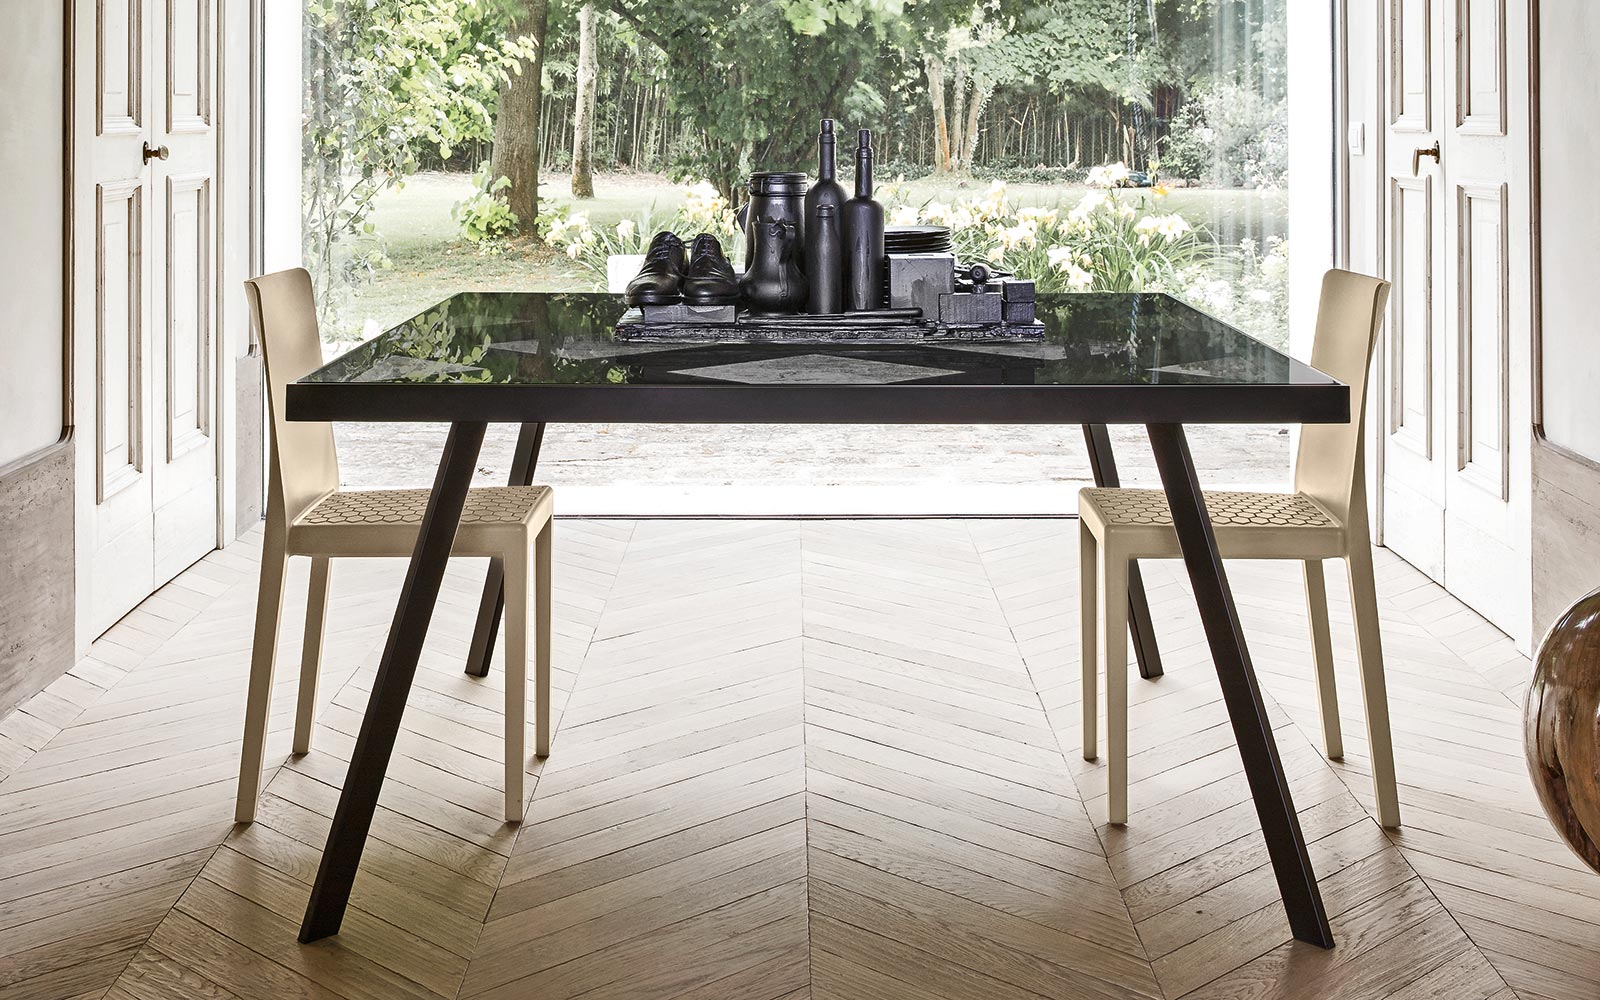 Frame tavoli calligaris ginocchi arredamenti - Tavolo quadrato allungabile calligaris ...